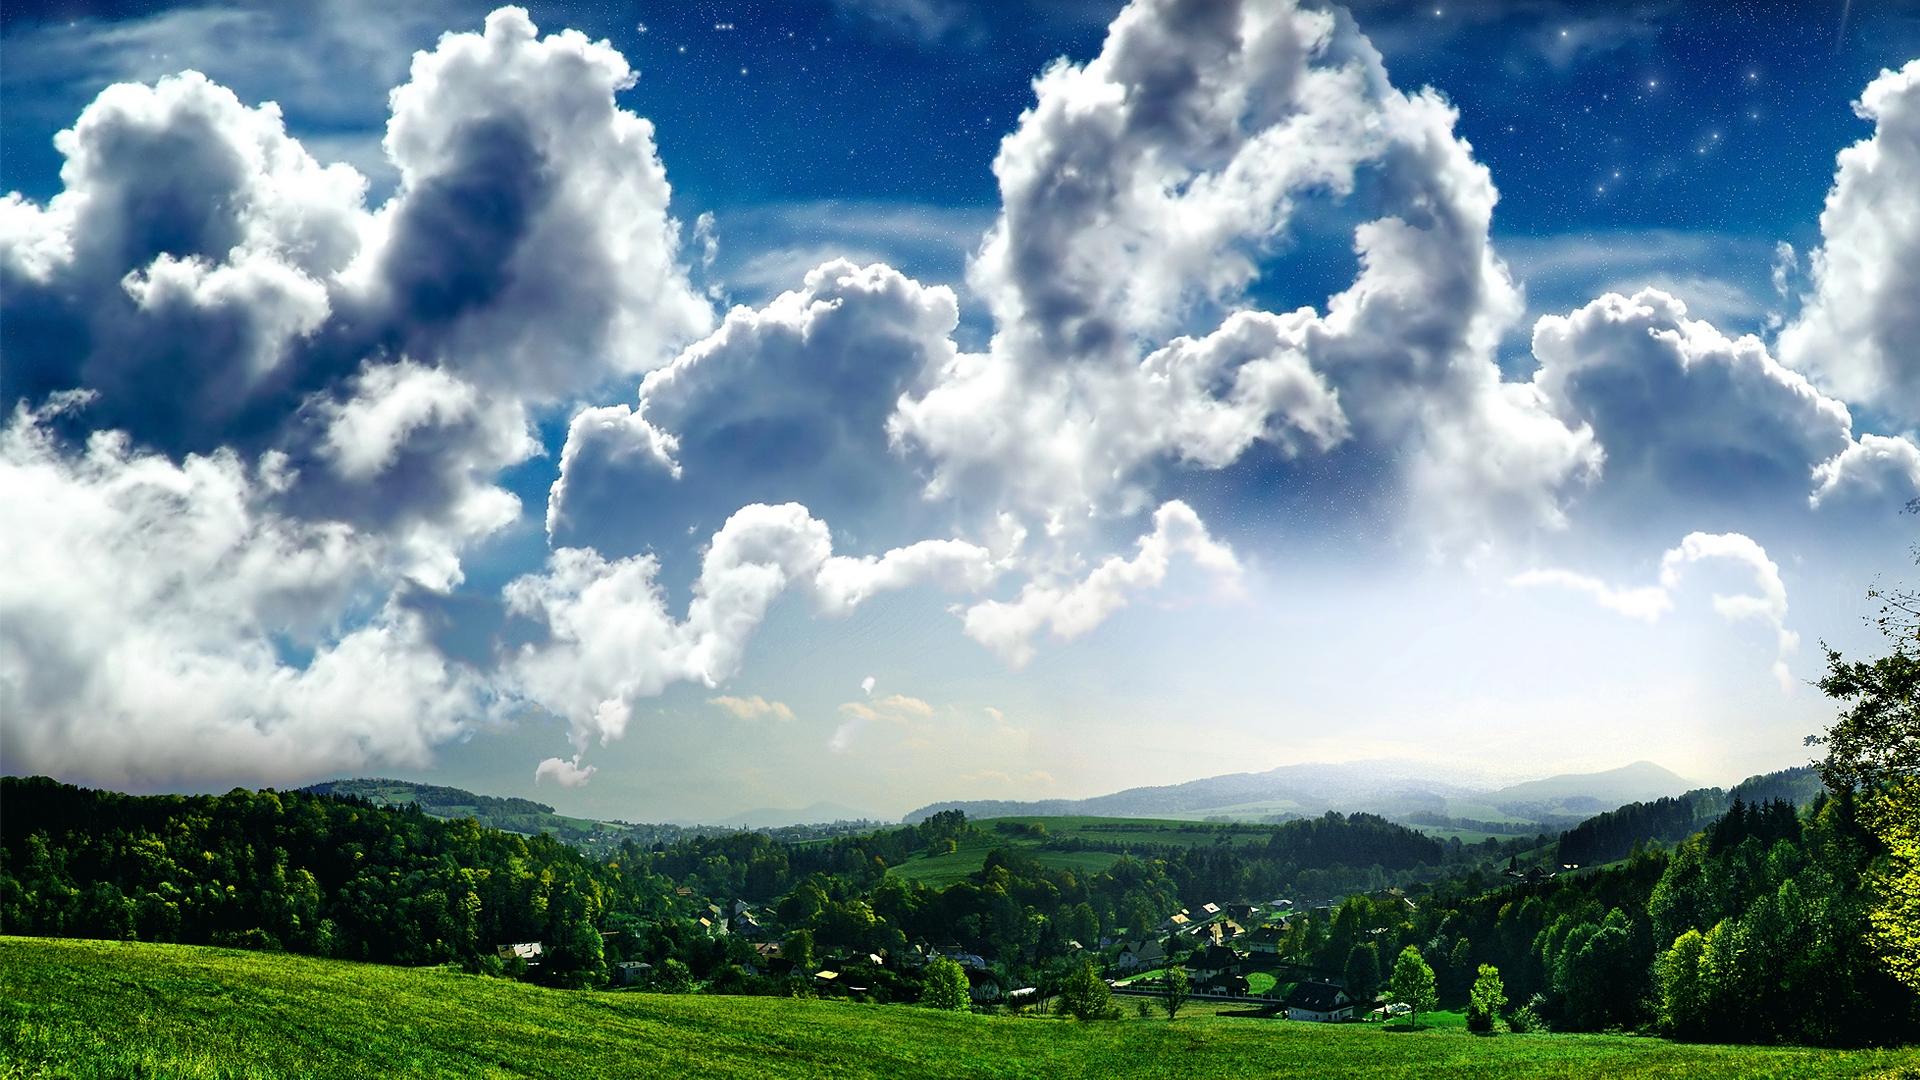 hd beautiful windows cloud and grass desktop wallpapers backgrounds 1920x1080